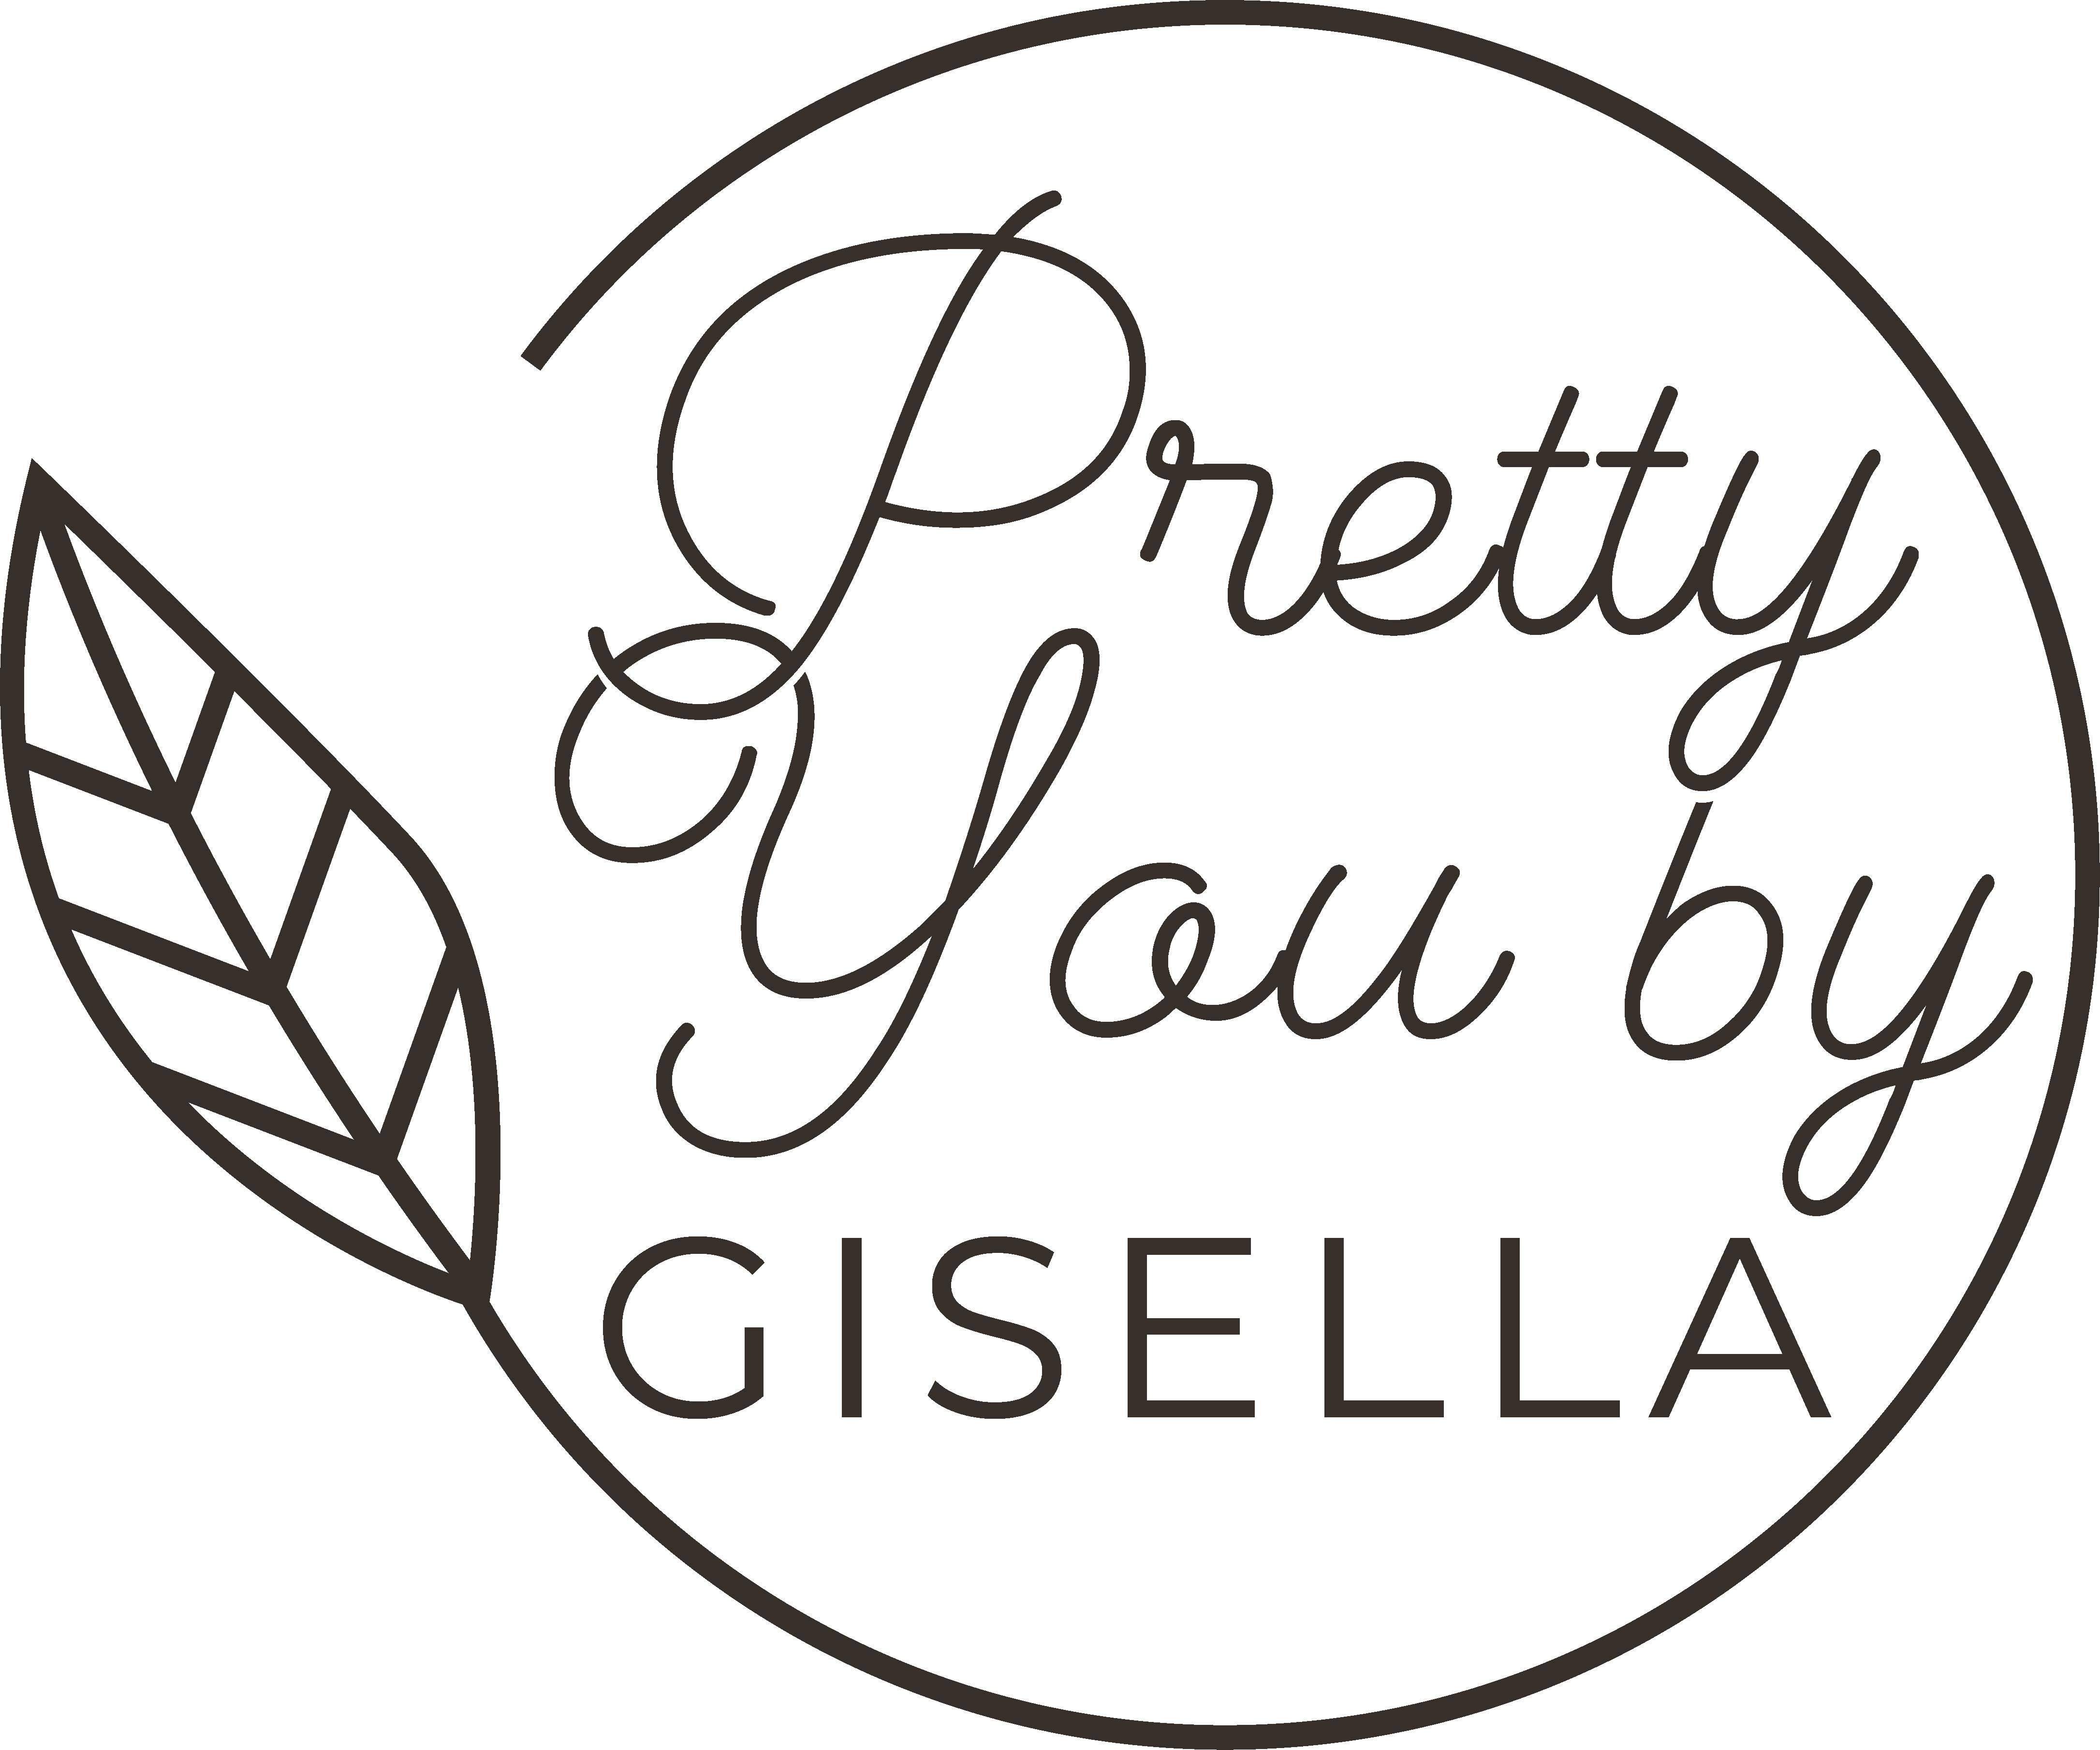 By Gisella